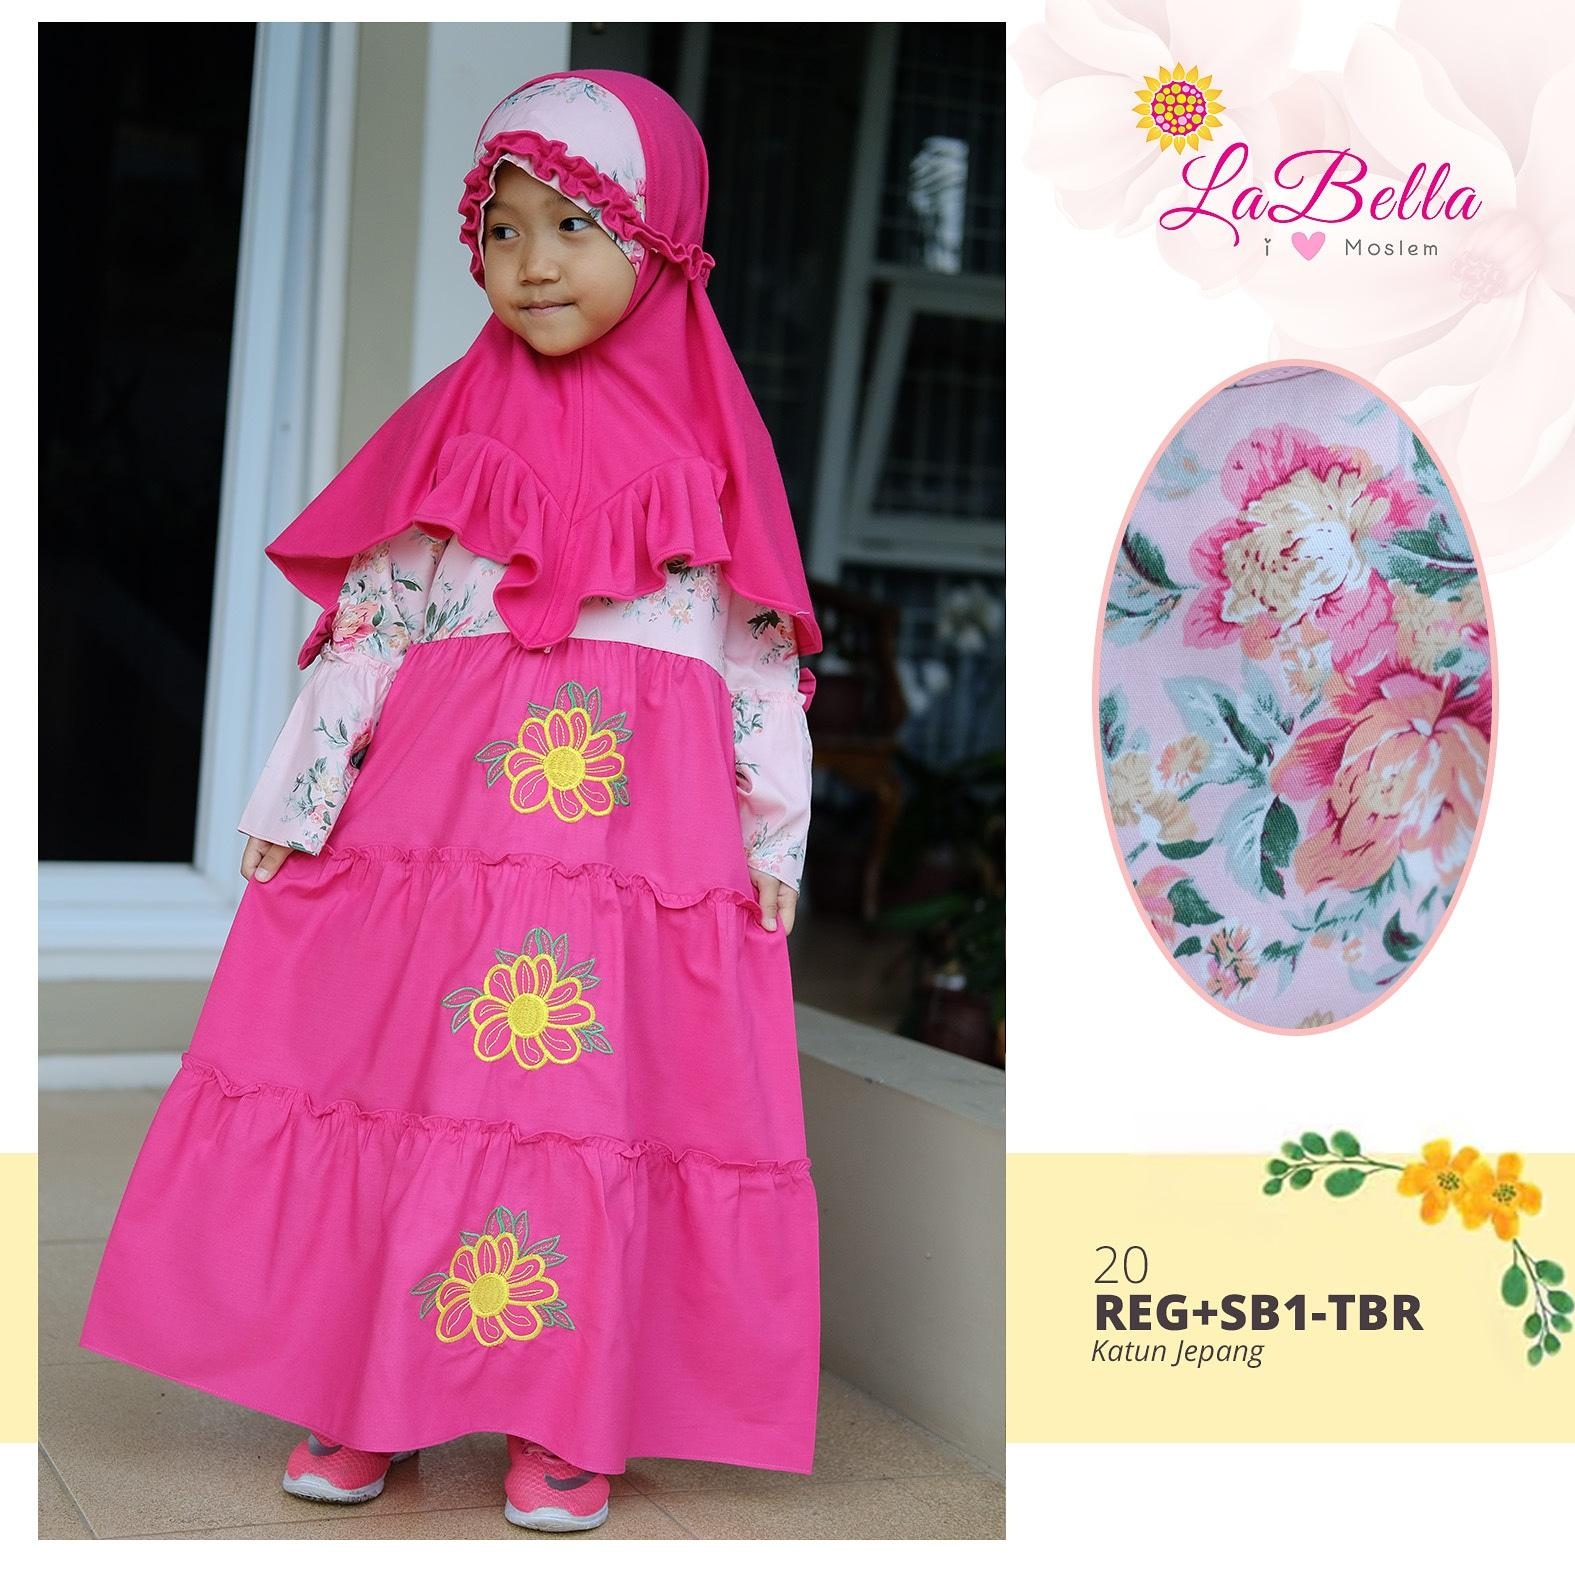 Gamis Anak LaBella 2-11th Katun Jepang Pink Bordir Bunga